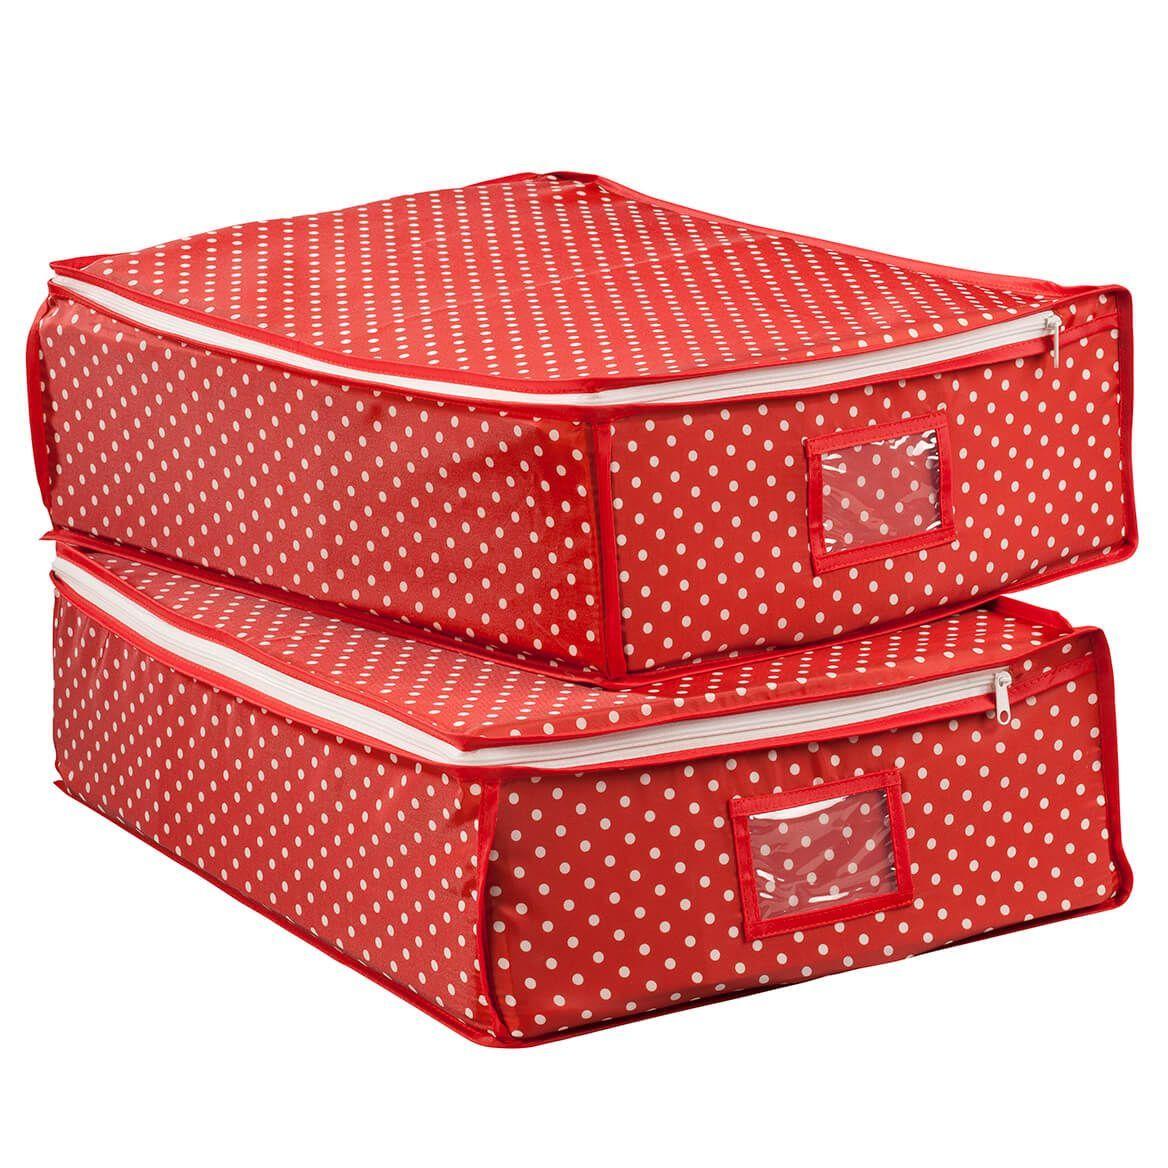 Fabric Zipper Storage Bags, 2-Pack by LivingSURE - Miles Kimball#2pack #bags #fabric #kimball #livingsure #miles #storage #zipper